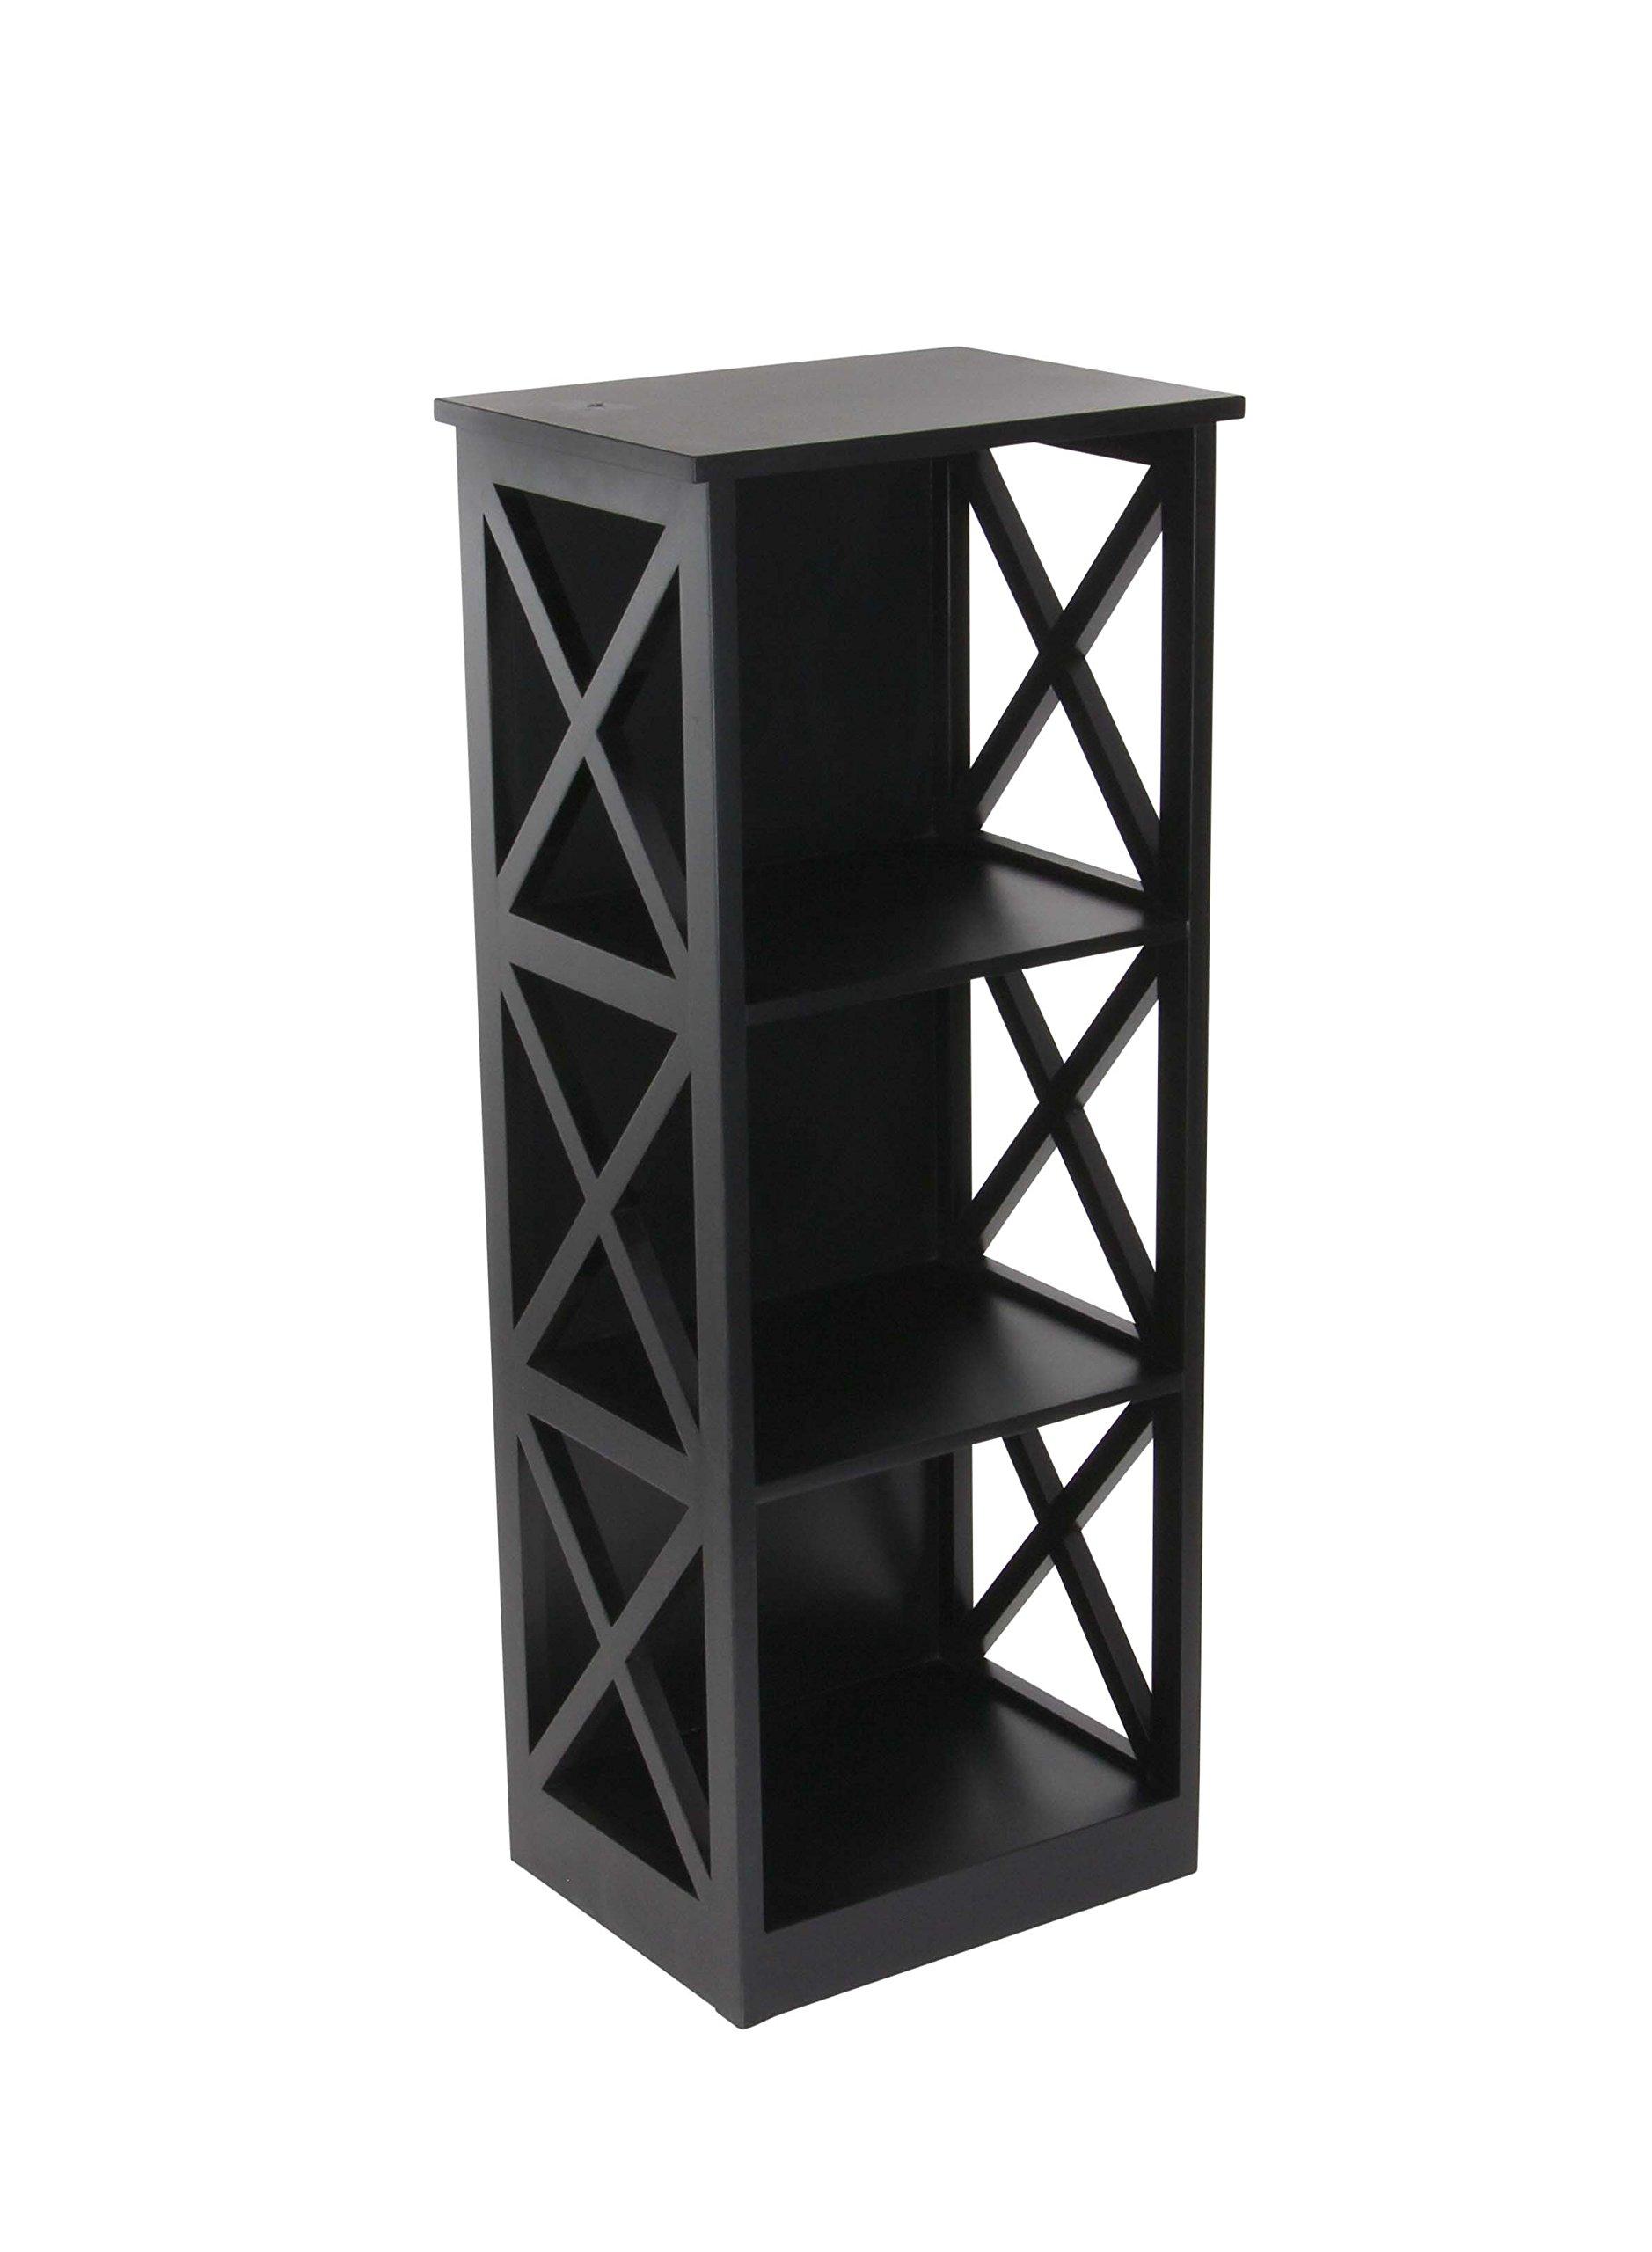 Deco 79 62683 Rectangular Wooden 3-Tiered Shelf, Black